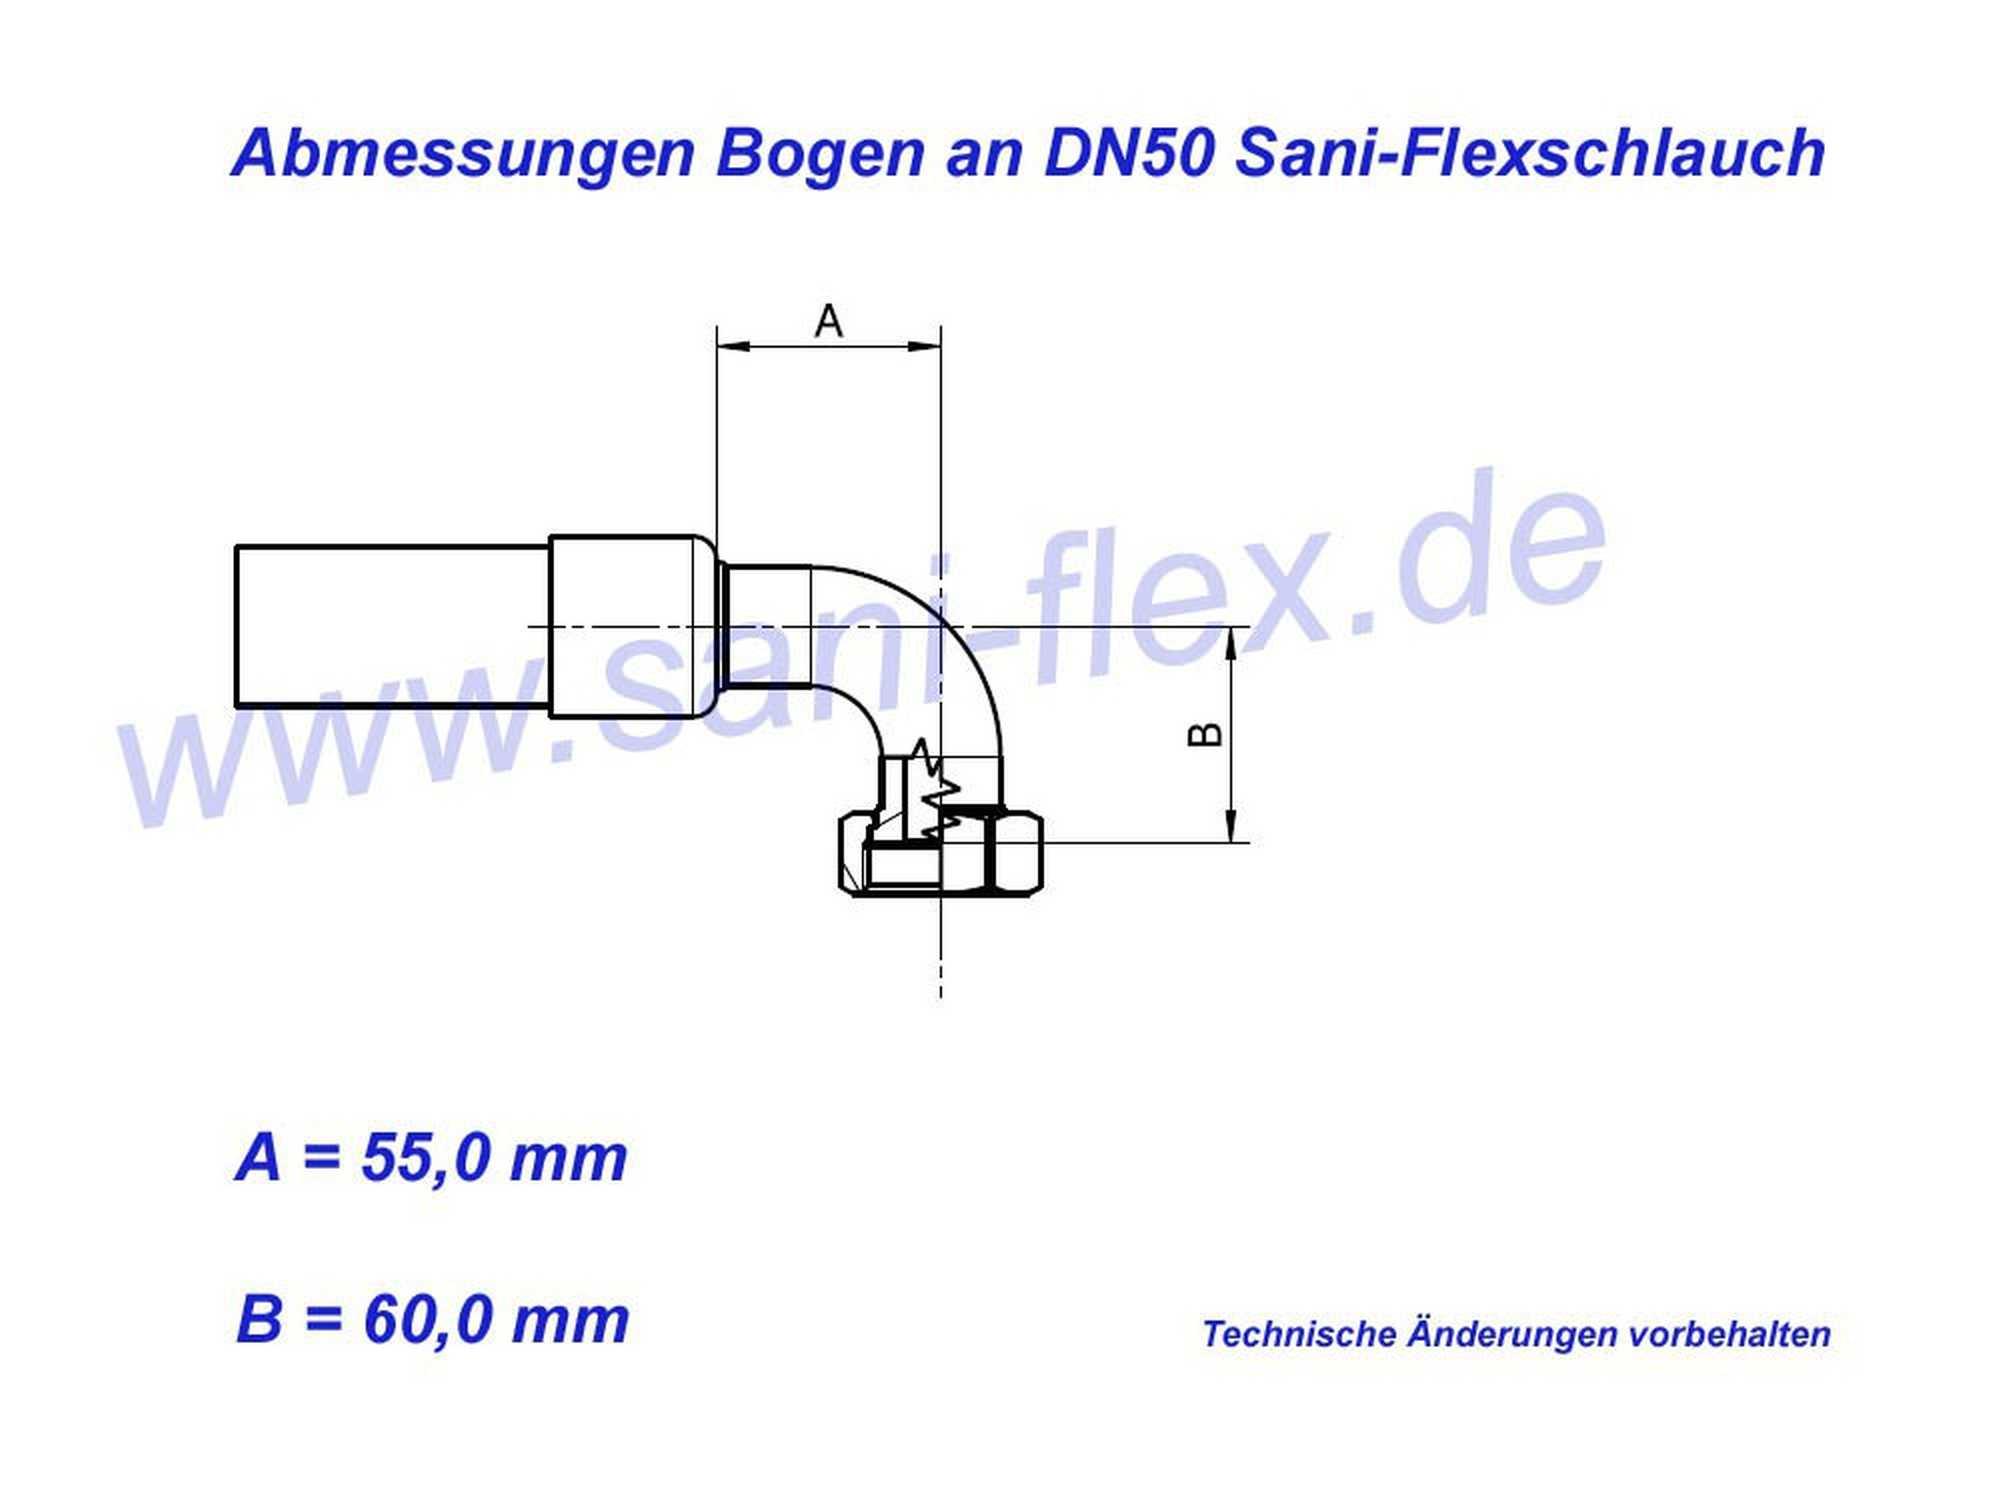 Abmessungen Bogen DN50 Panzerschlauch